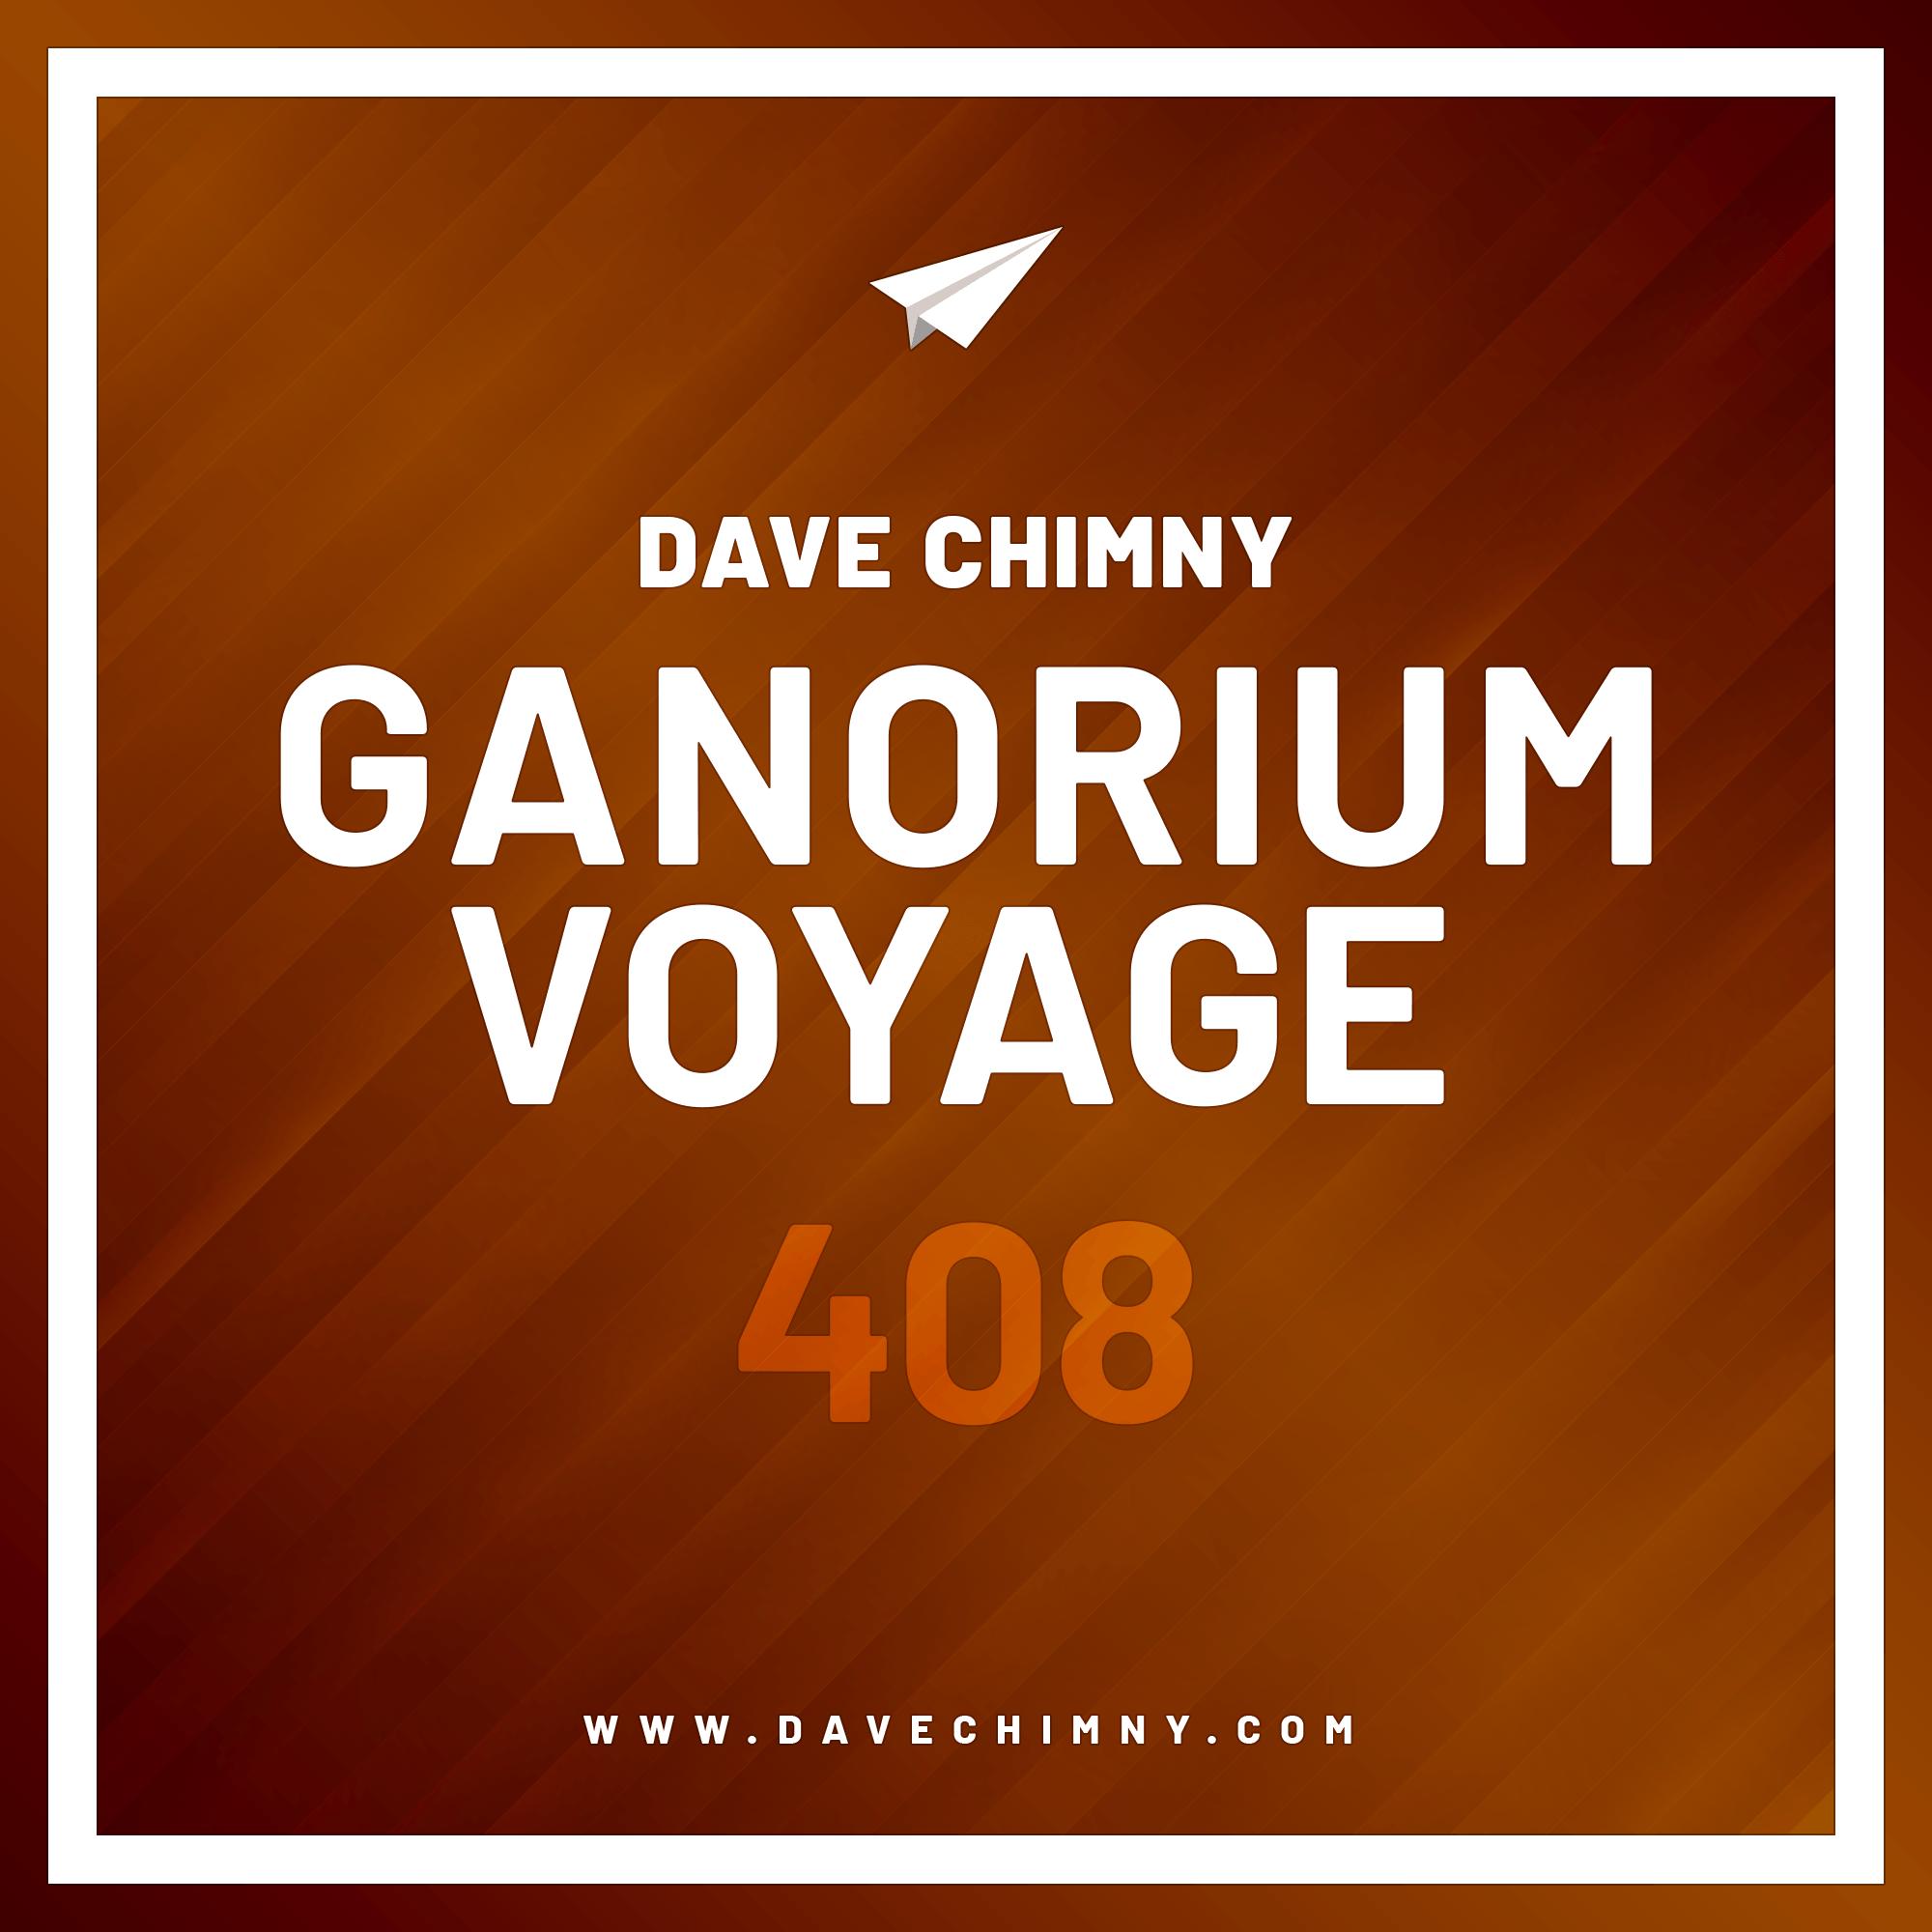 Dave Chimny – Ganorium Voyage 408